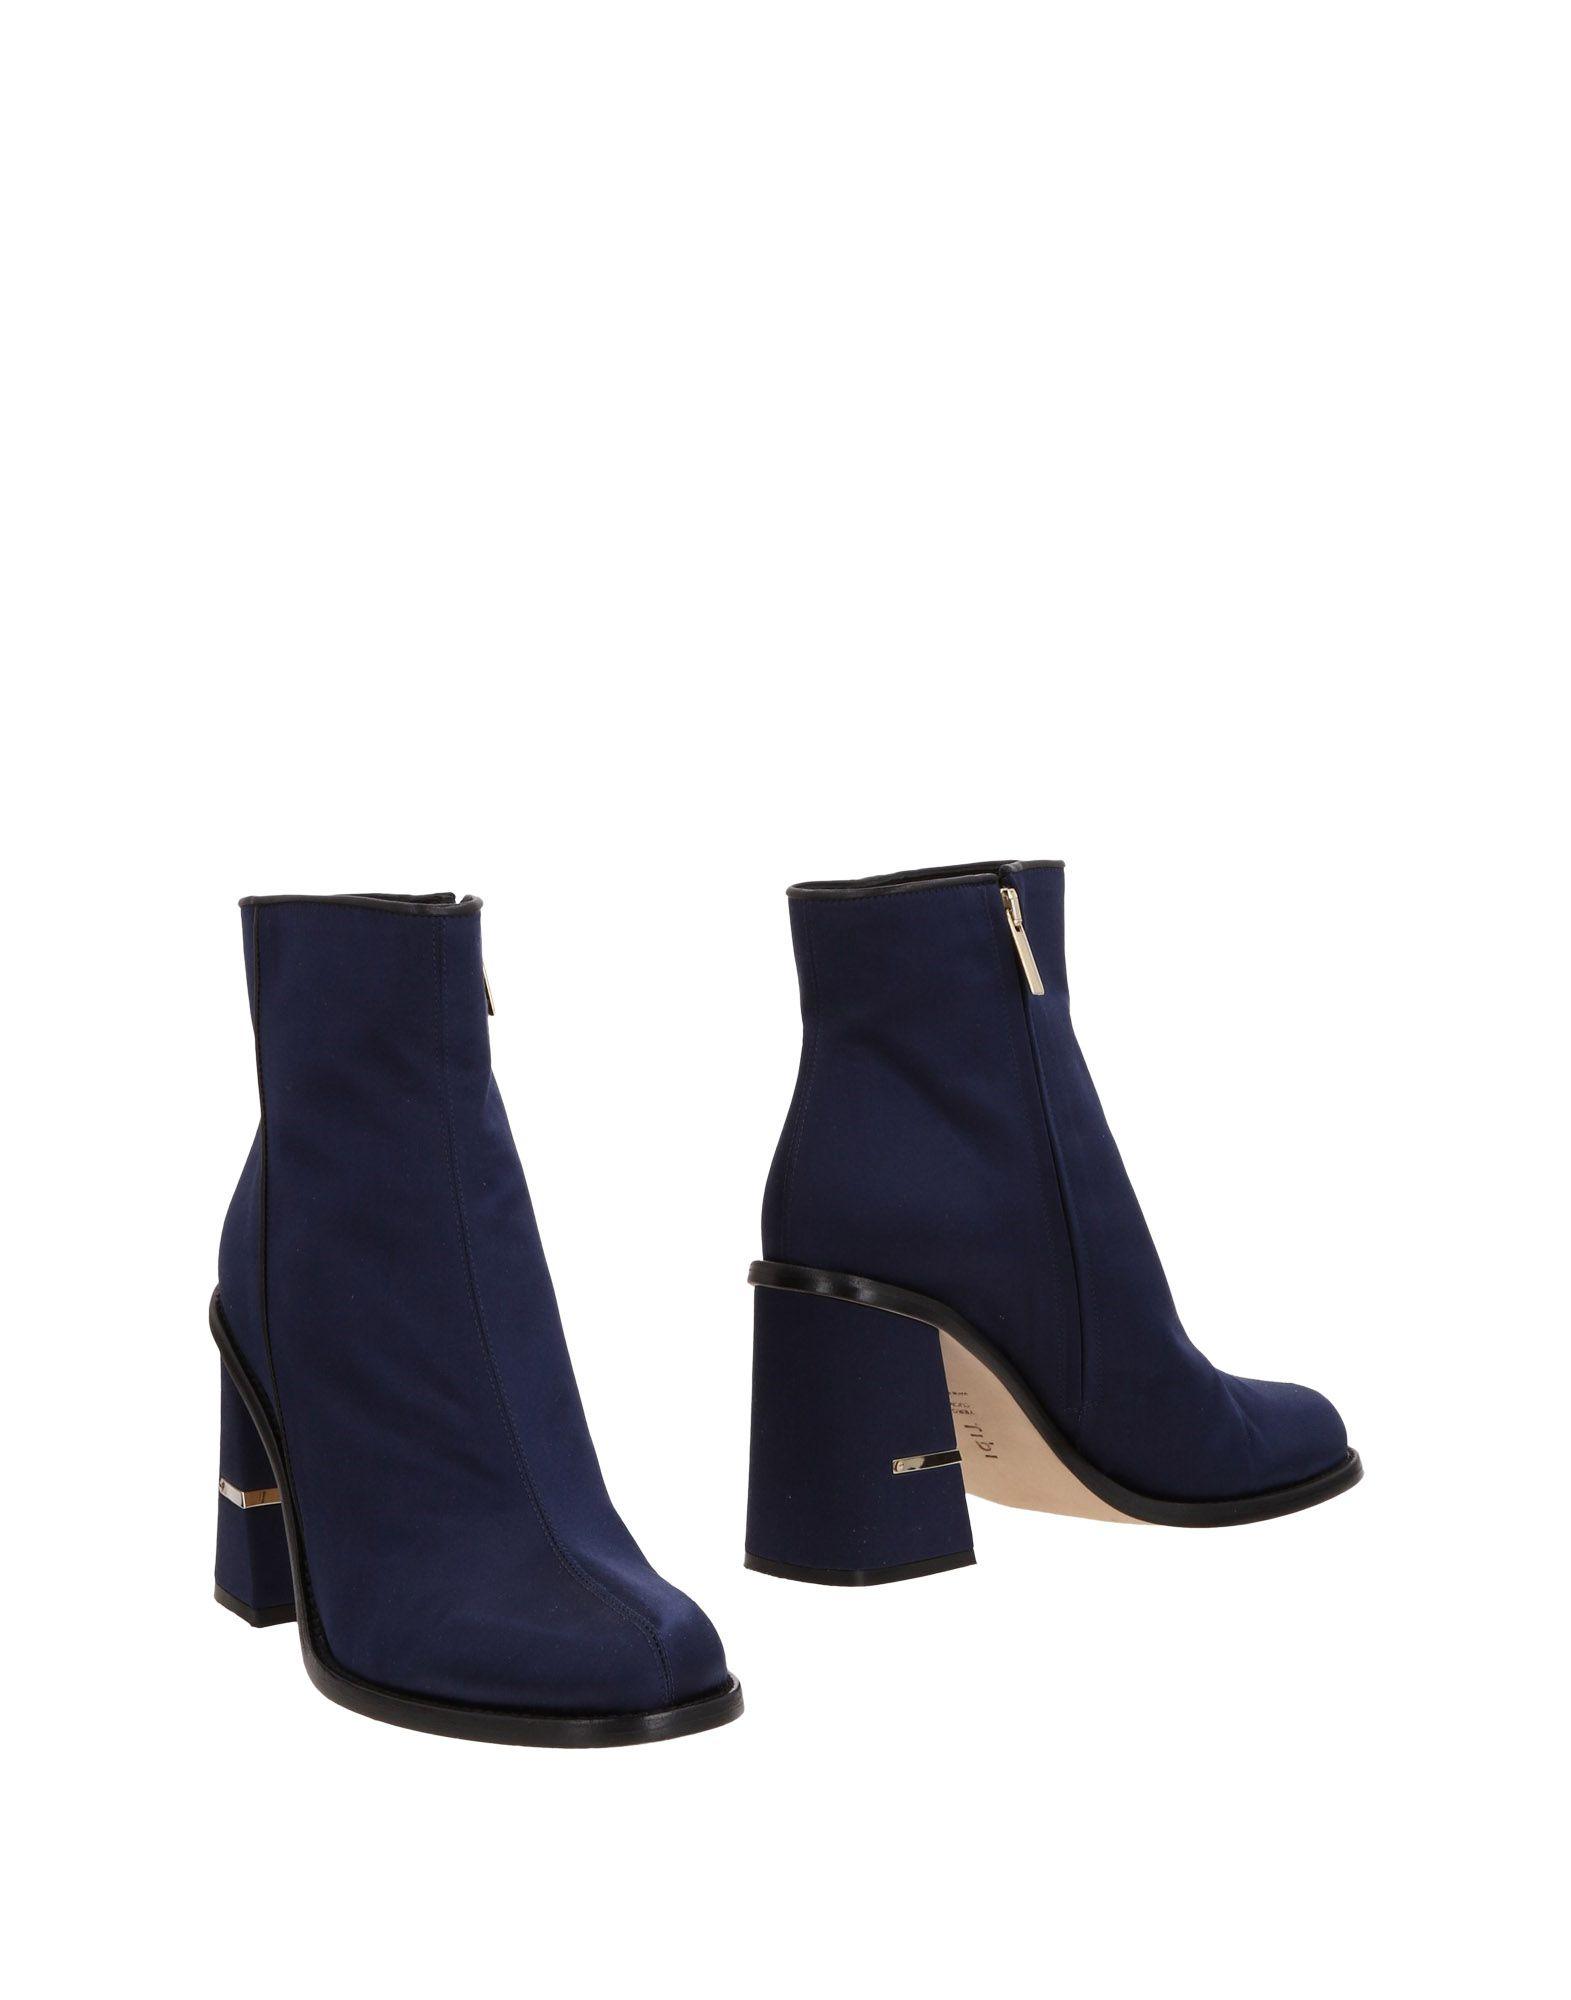 Moda Stivaletti Tibi Donna - 11462984CI